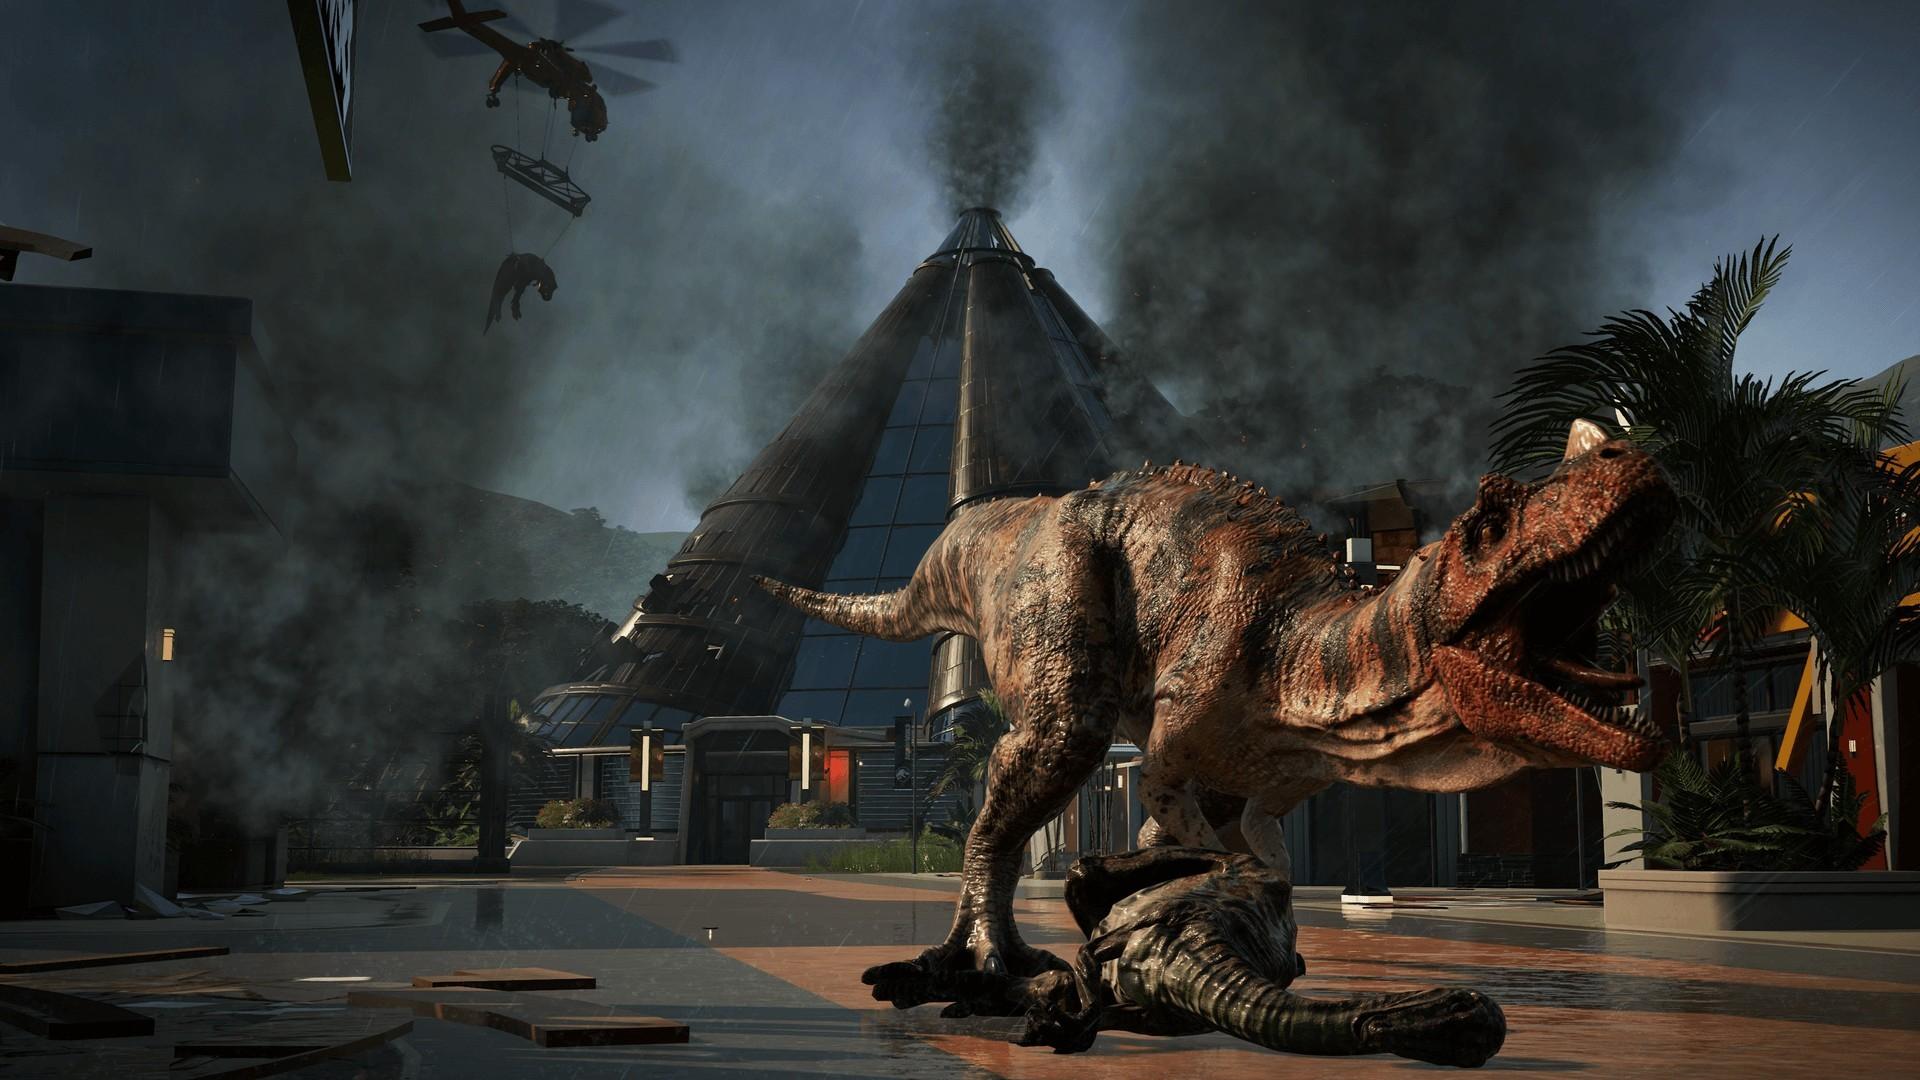 Jurassic Park Nature Finds A Way